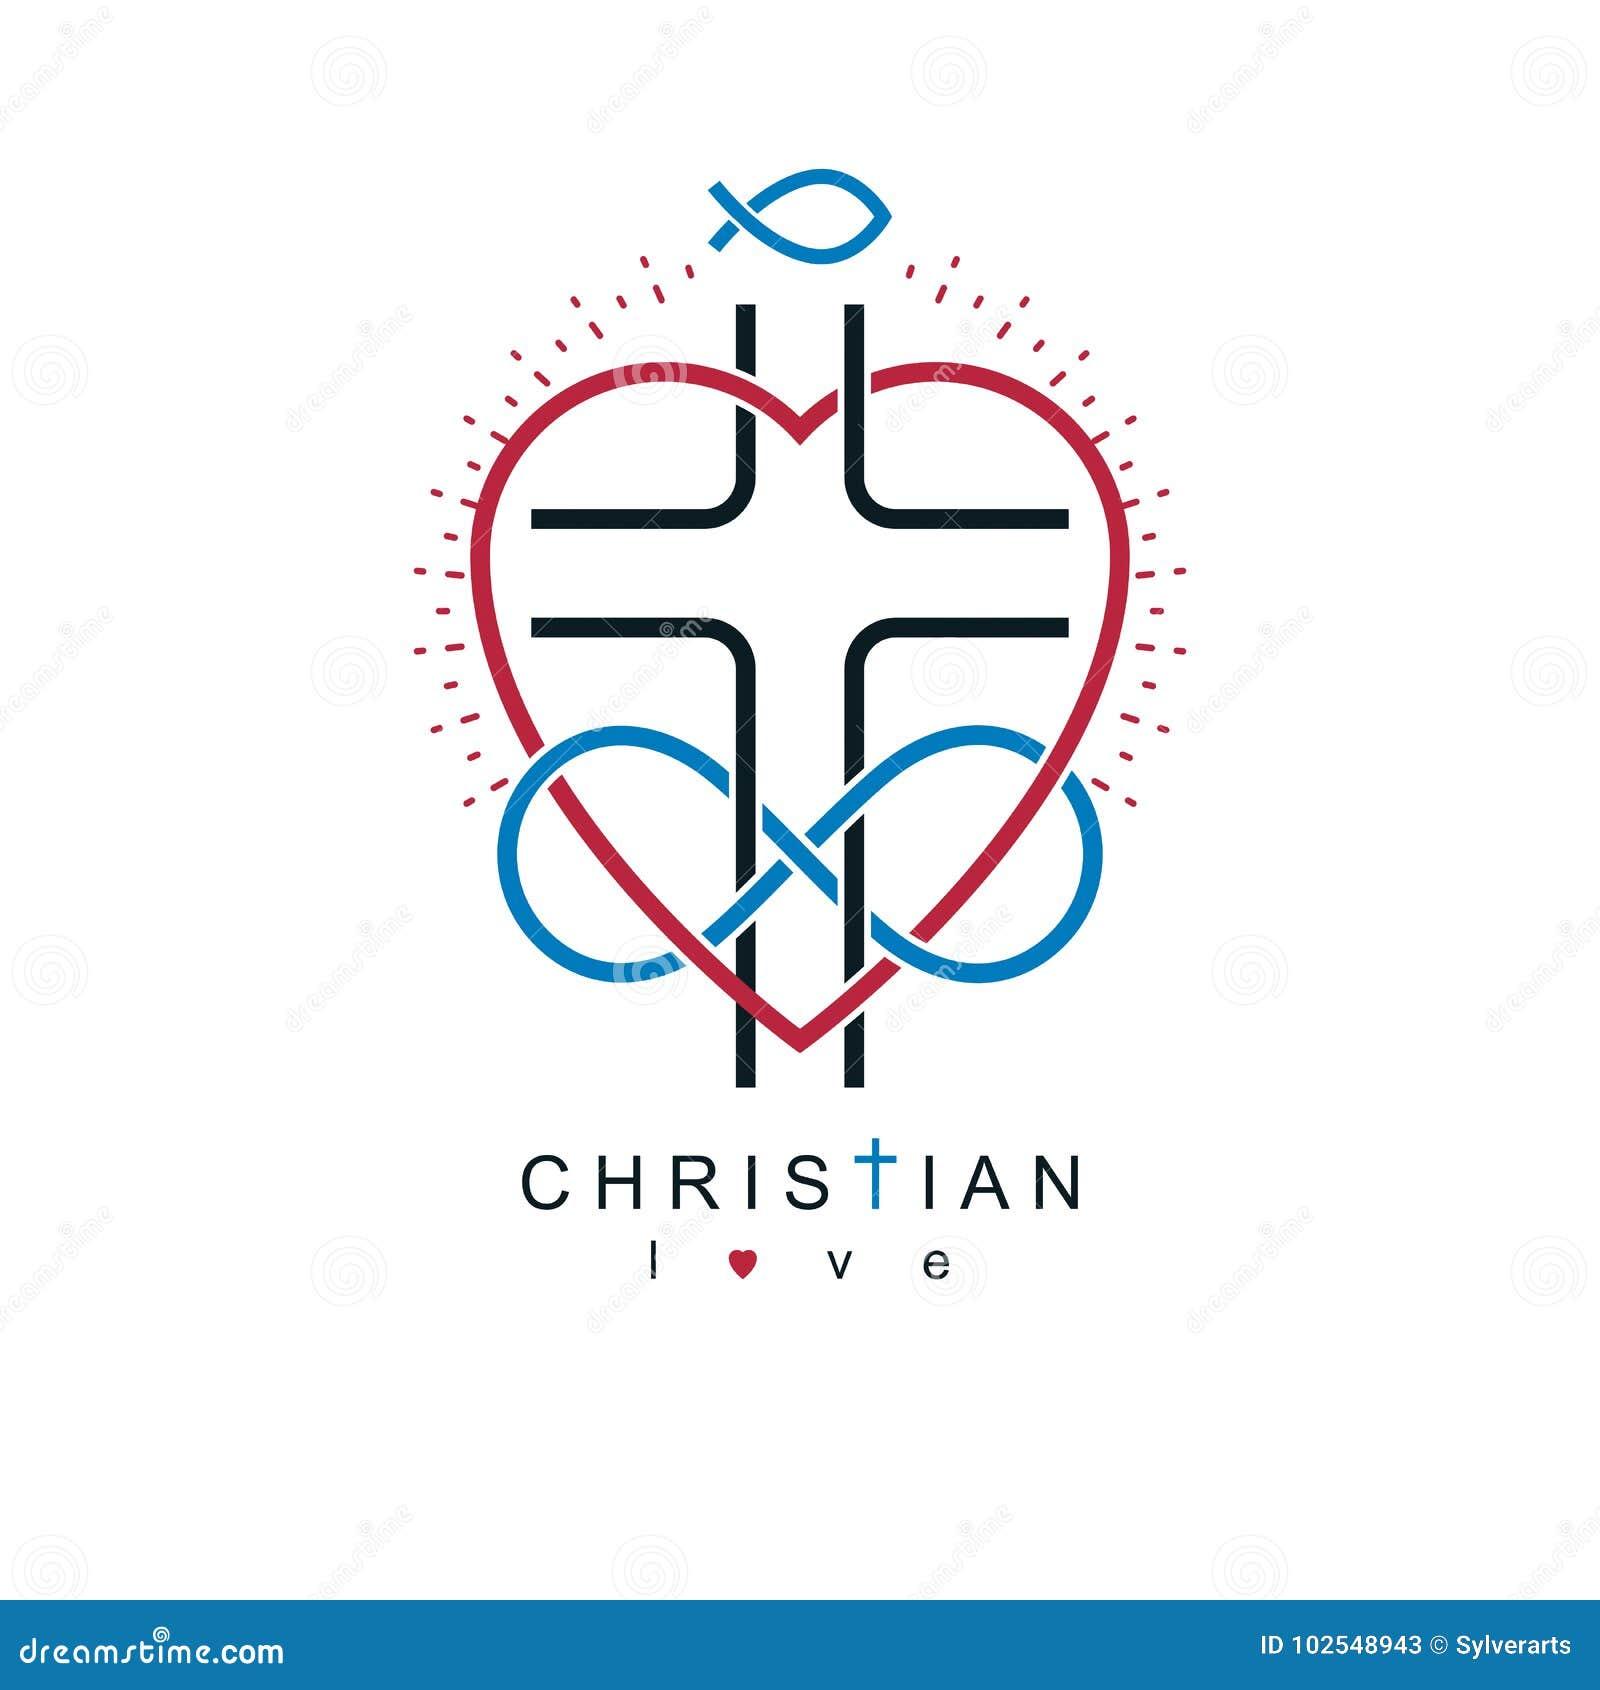 Symbols of everlasting love choice image symbol and sign ideas symbols of everlasting love choice image symbol and sign ideas symbols of everlasting love image collections biocorpaavc